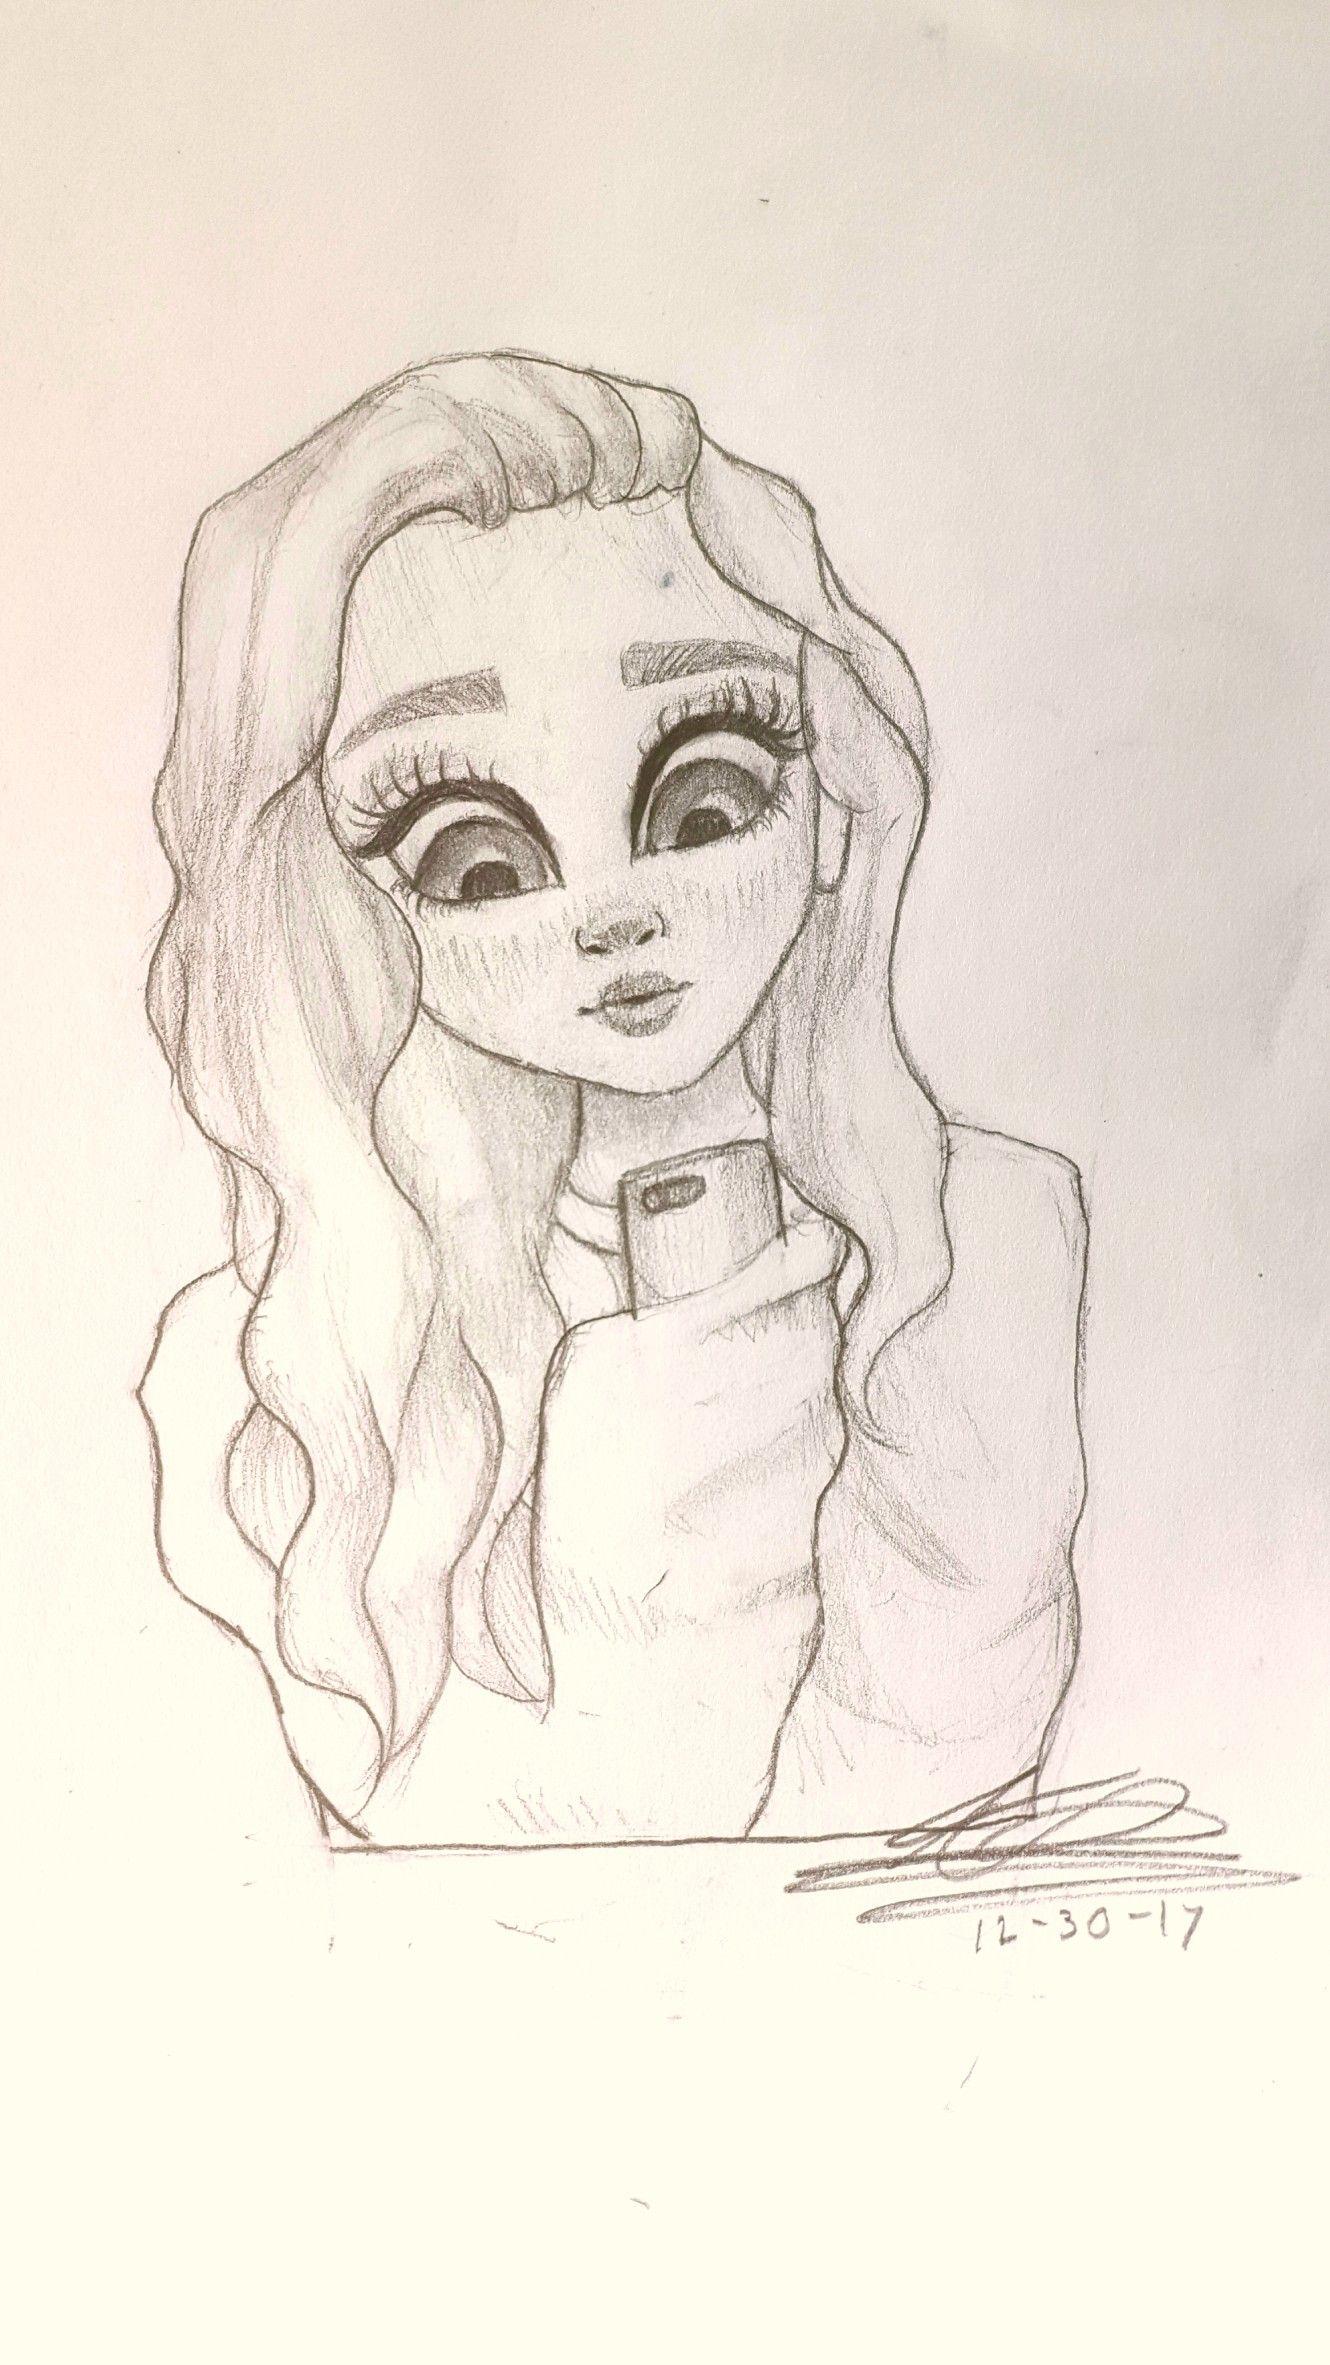 Pin on Pencil Art